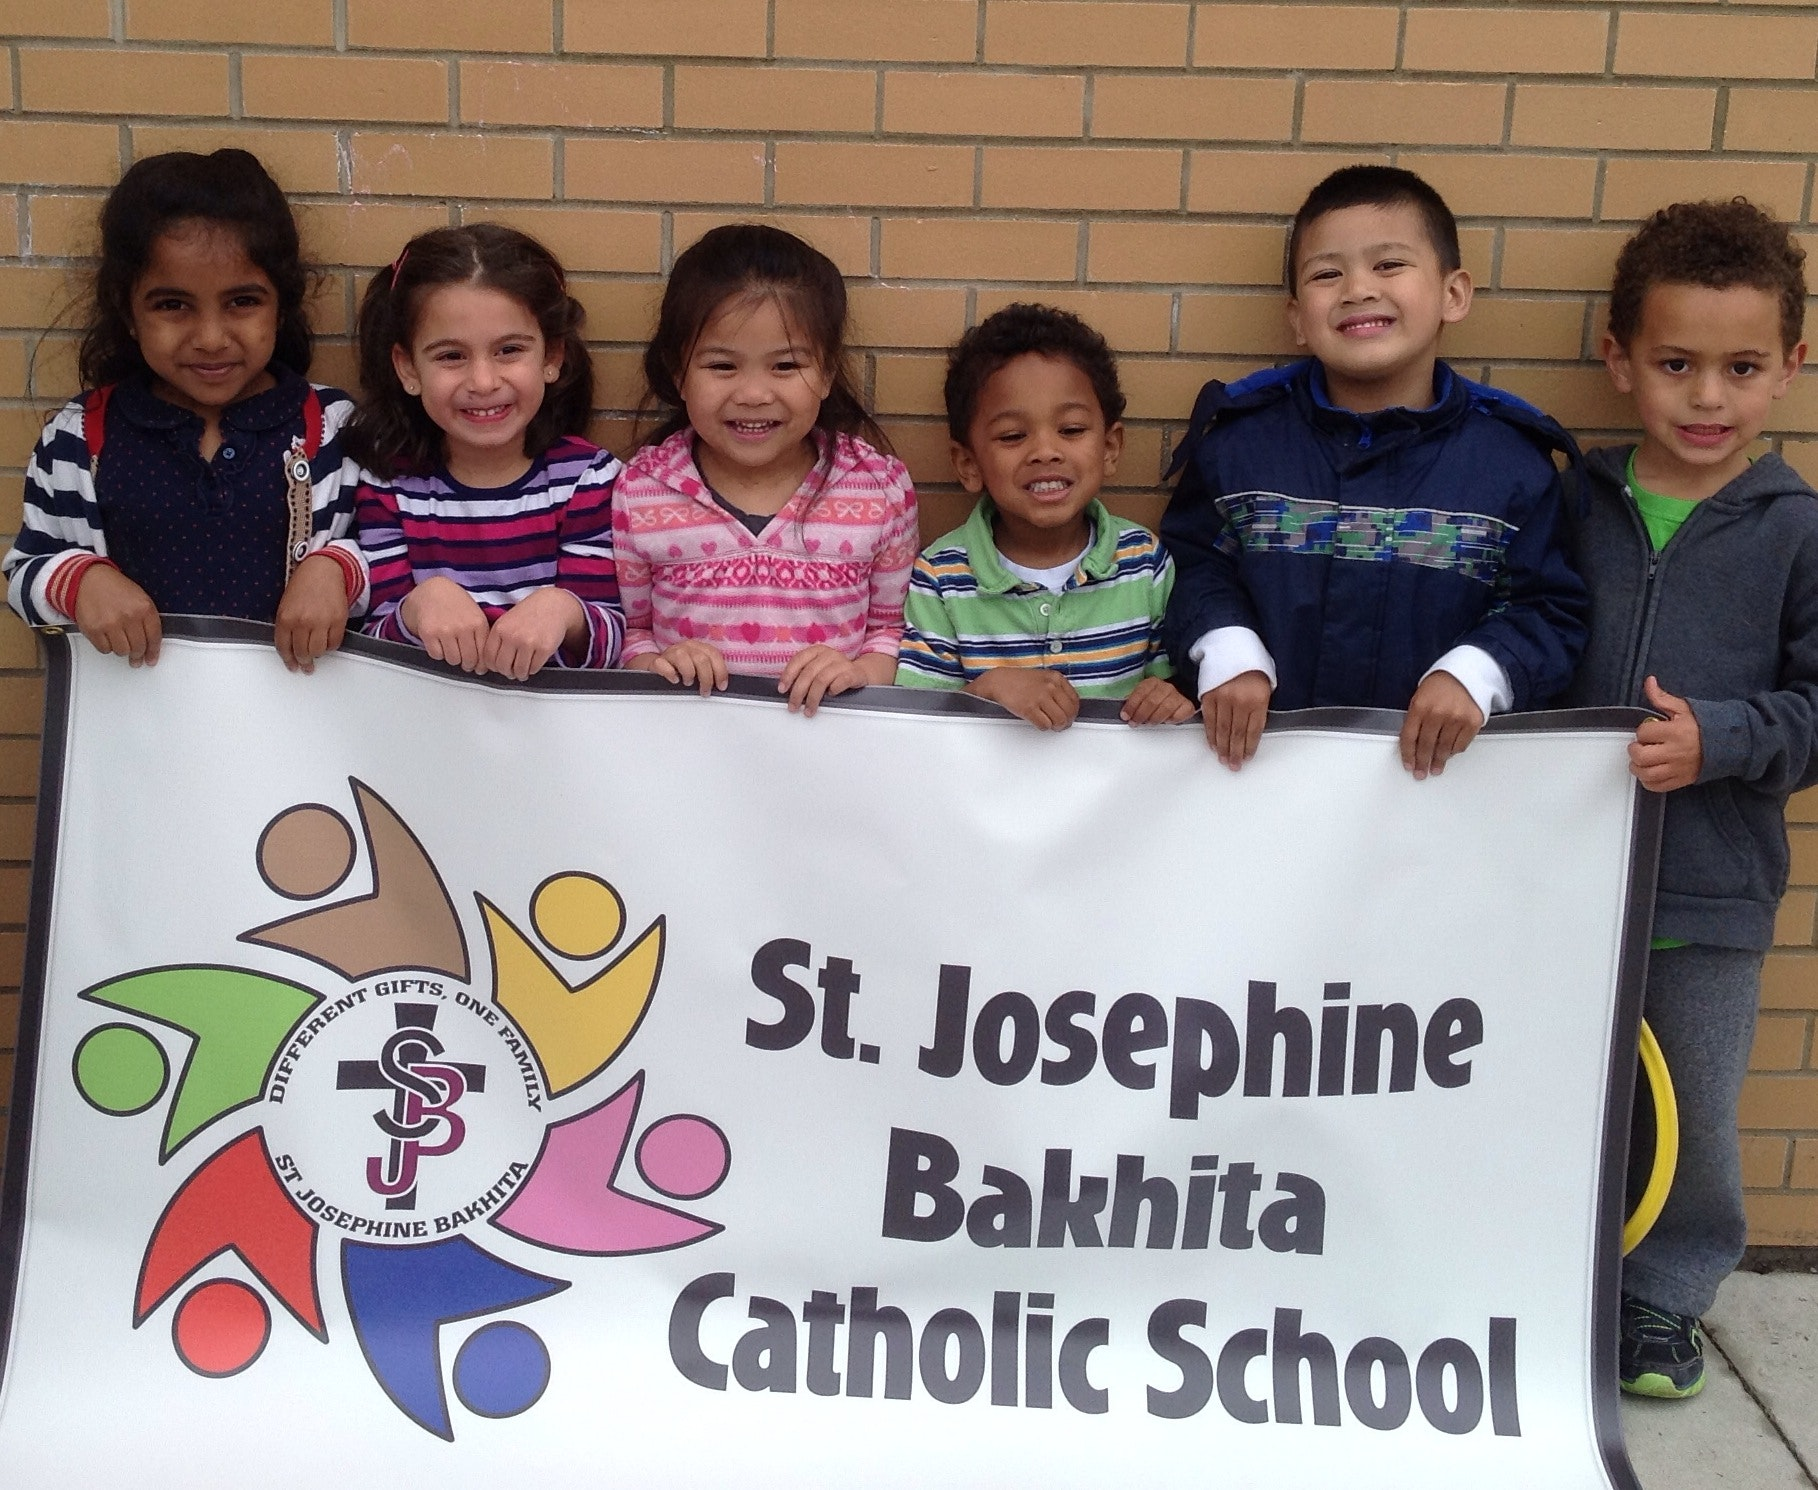 St. Josephine Bakhita Catholic School